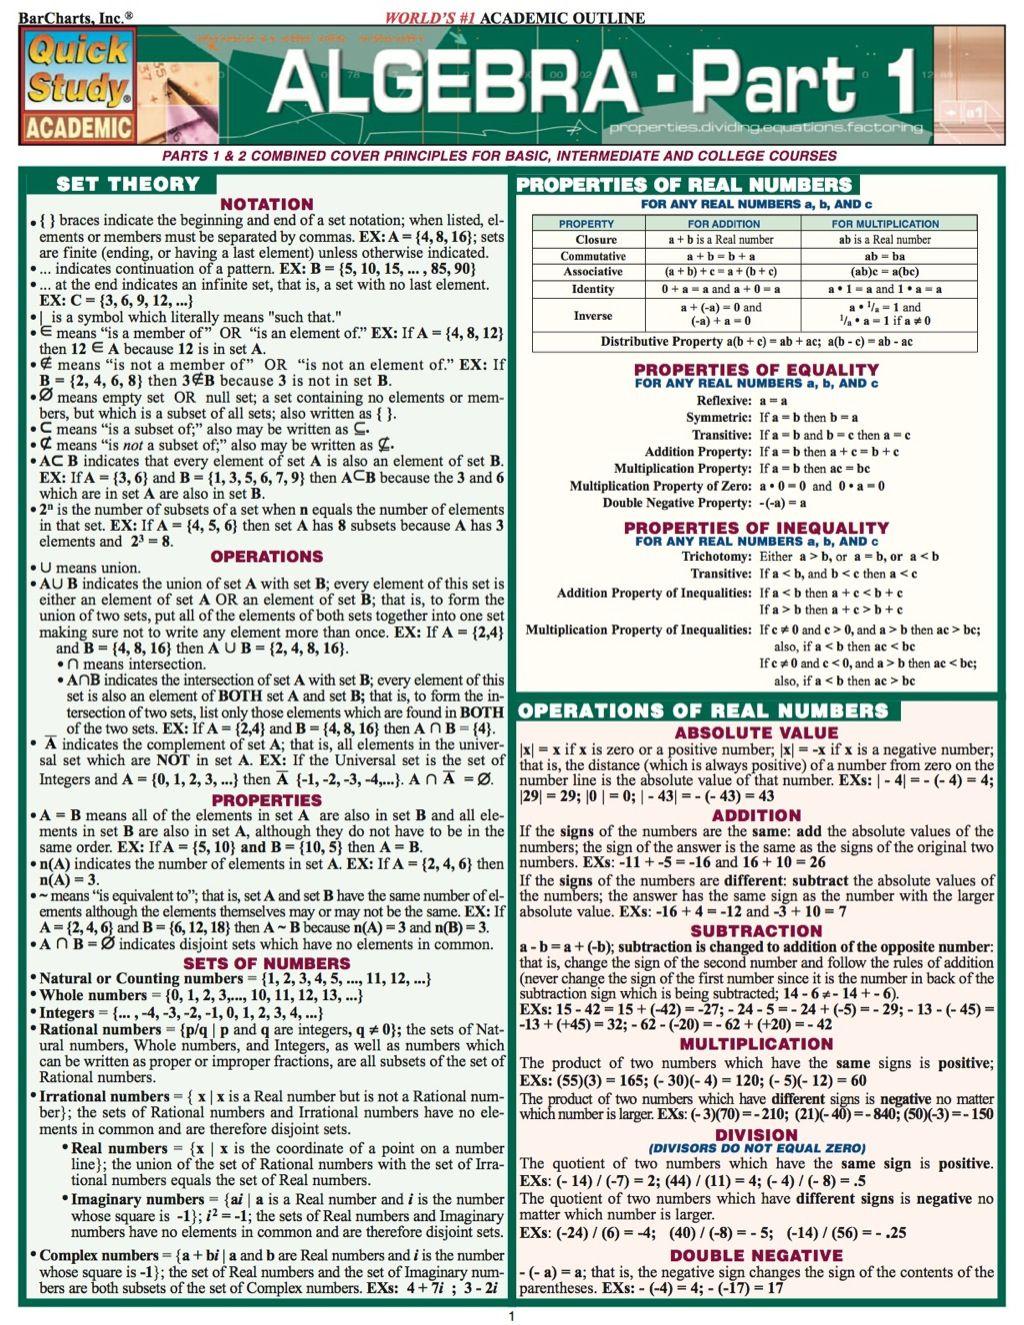 Algebra Part 1 Study Guide Ebook Rental